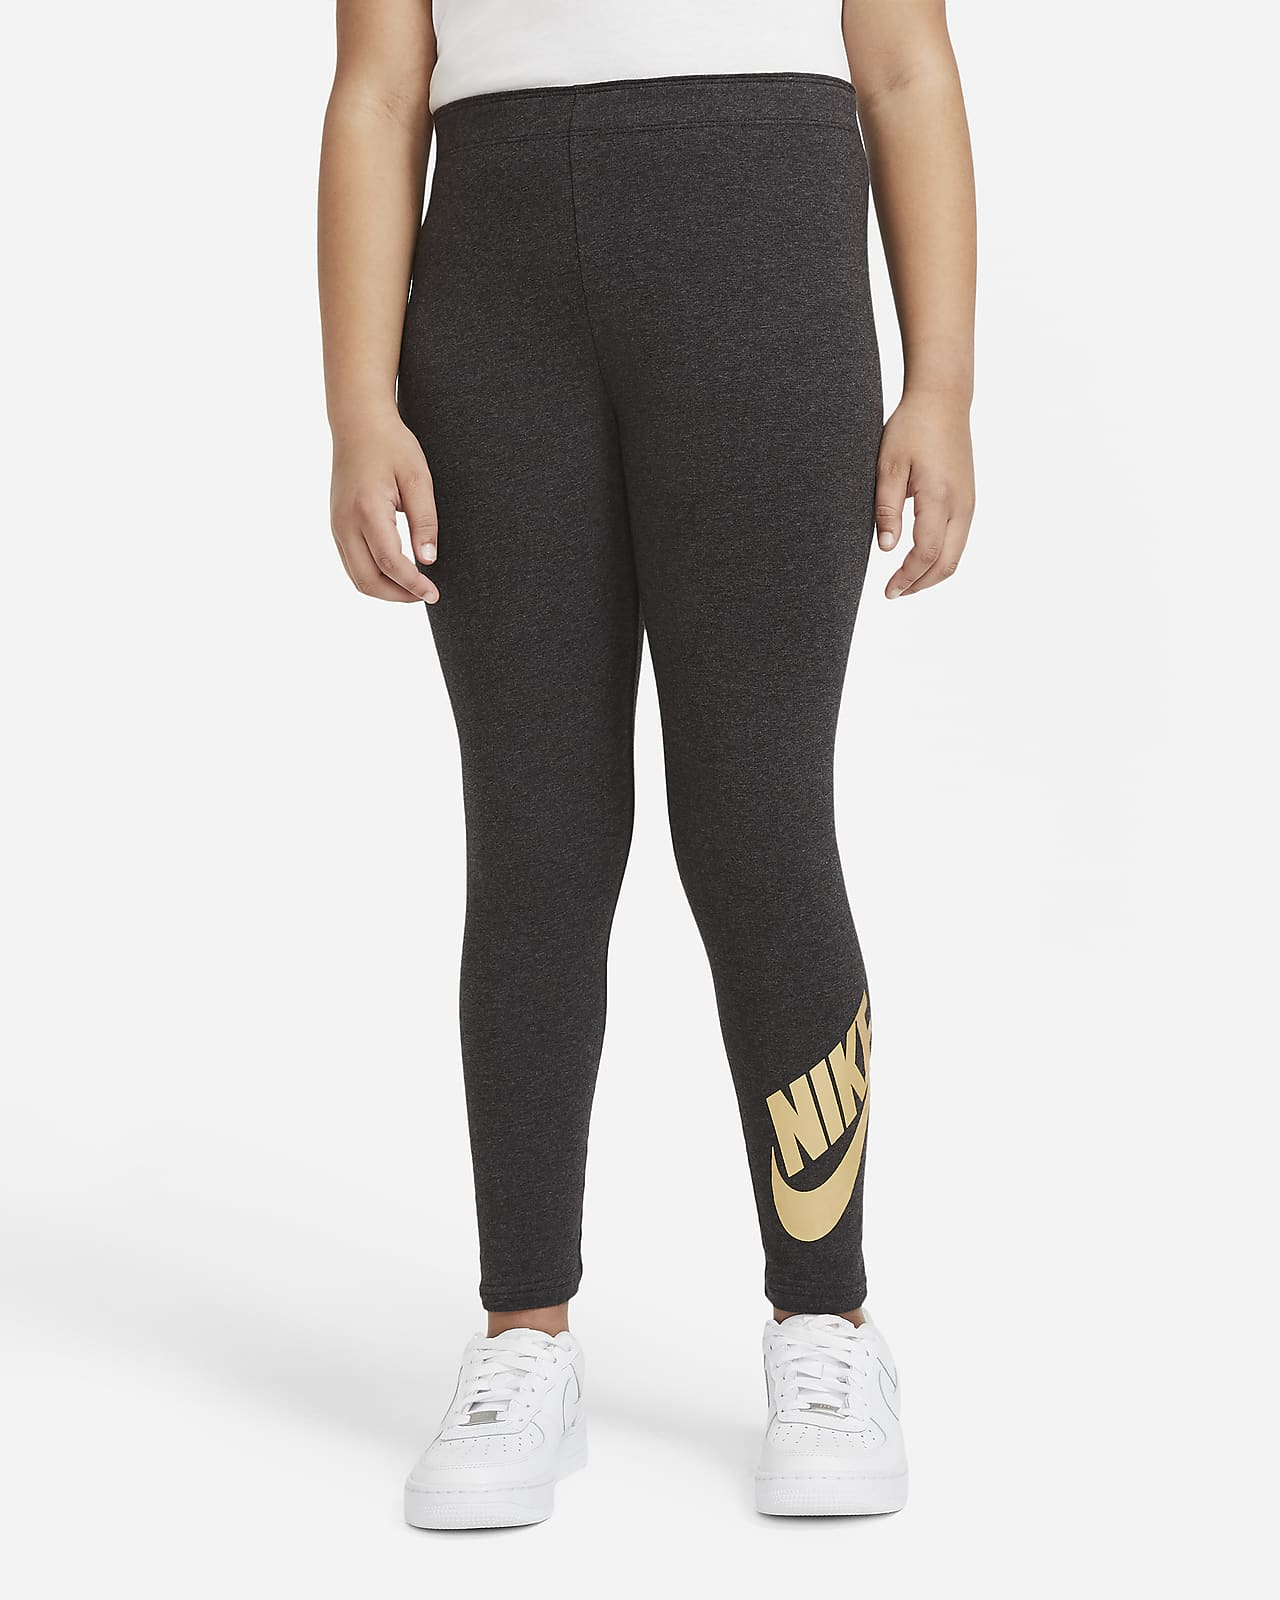 Legging Nike Sportswear Favorites pour Fille plus âgée (grande taille)